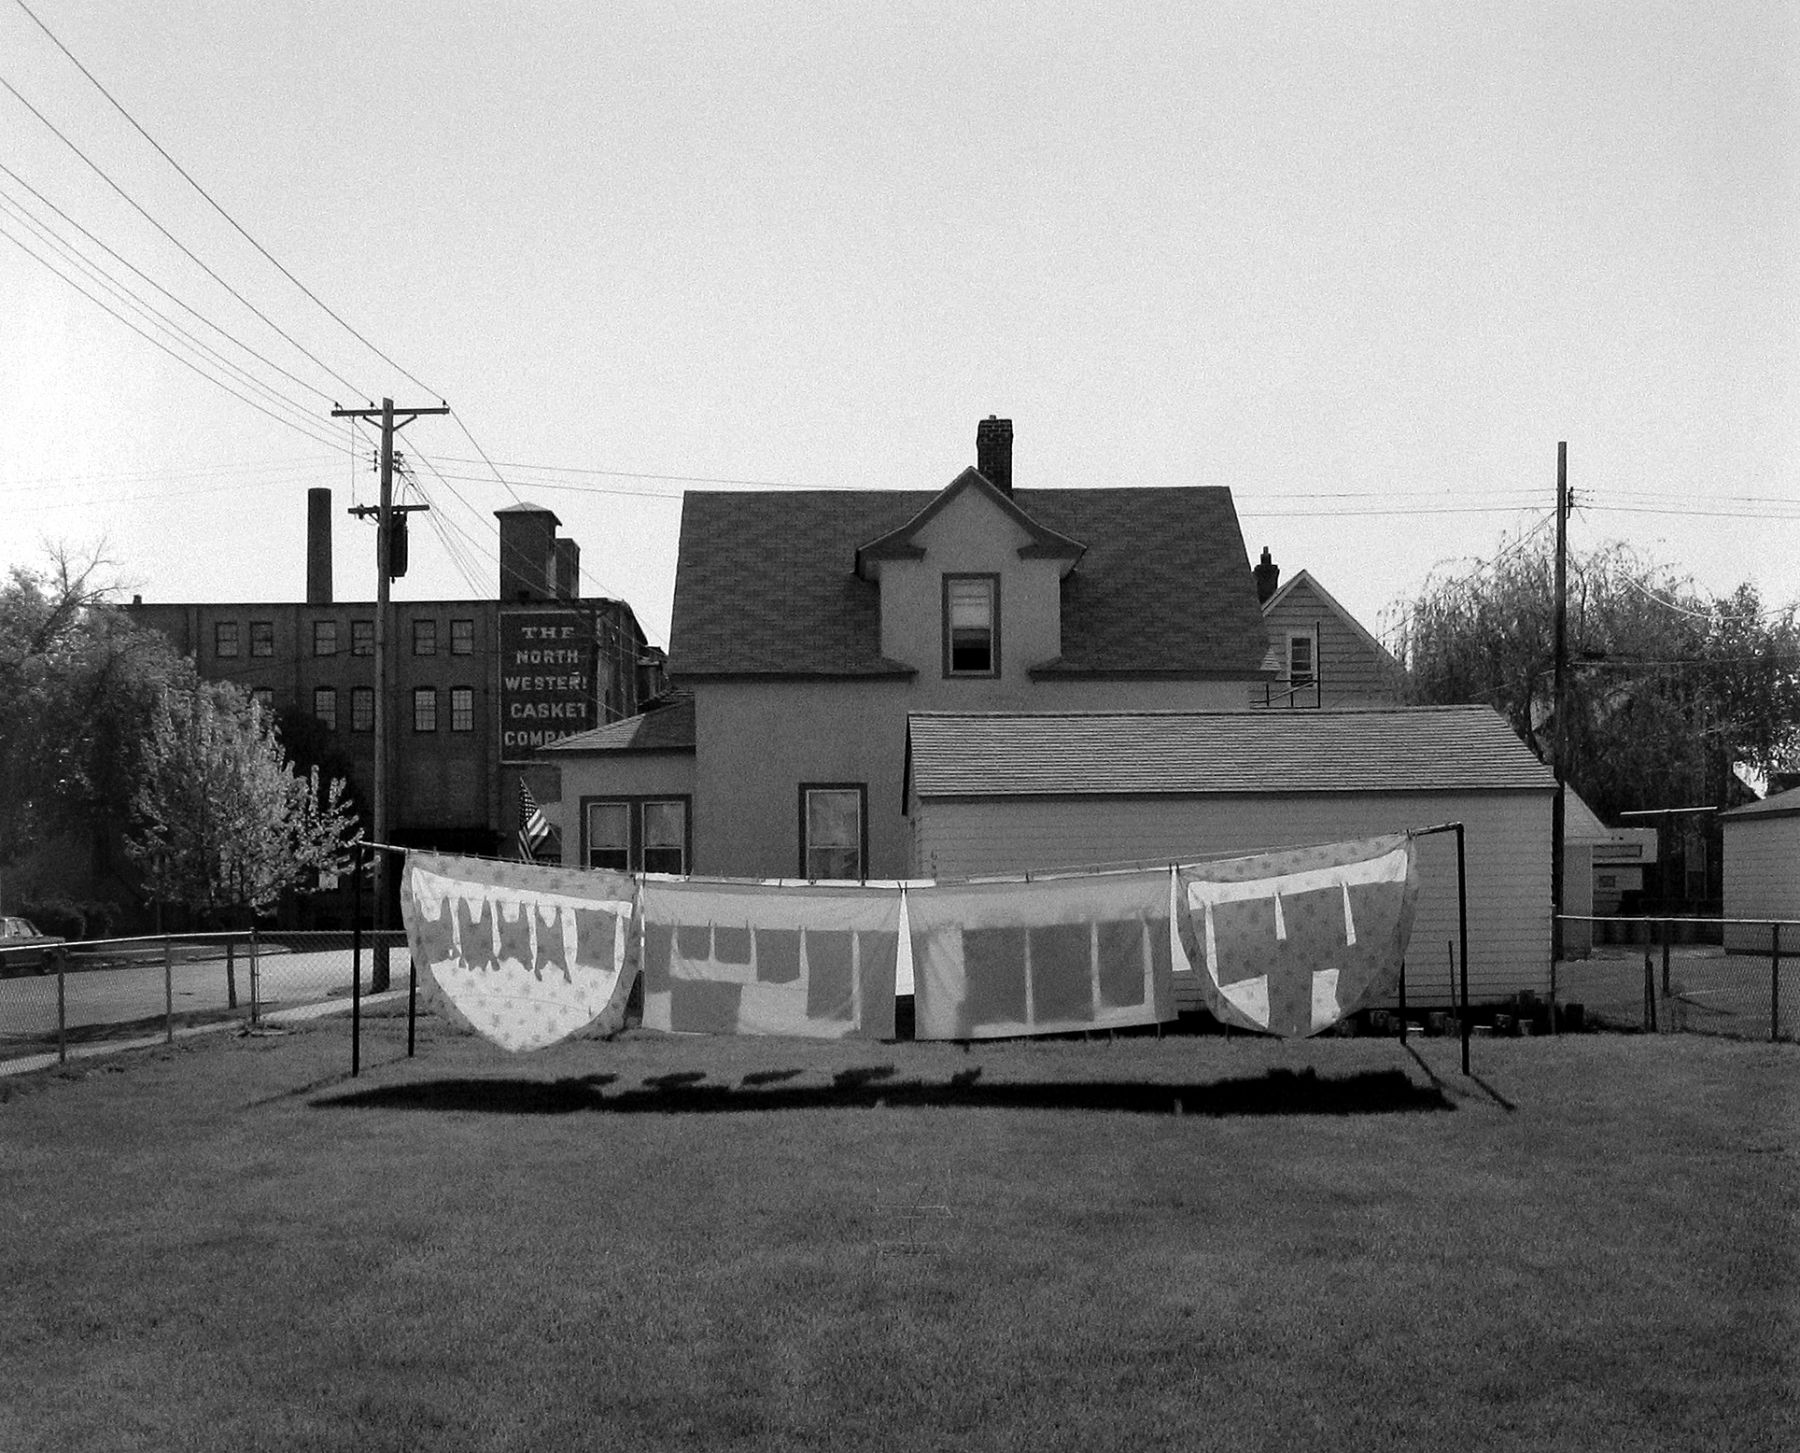 Frank Gohlke: Houses 2008 Howard Greenberg Gallery